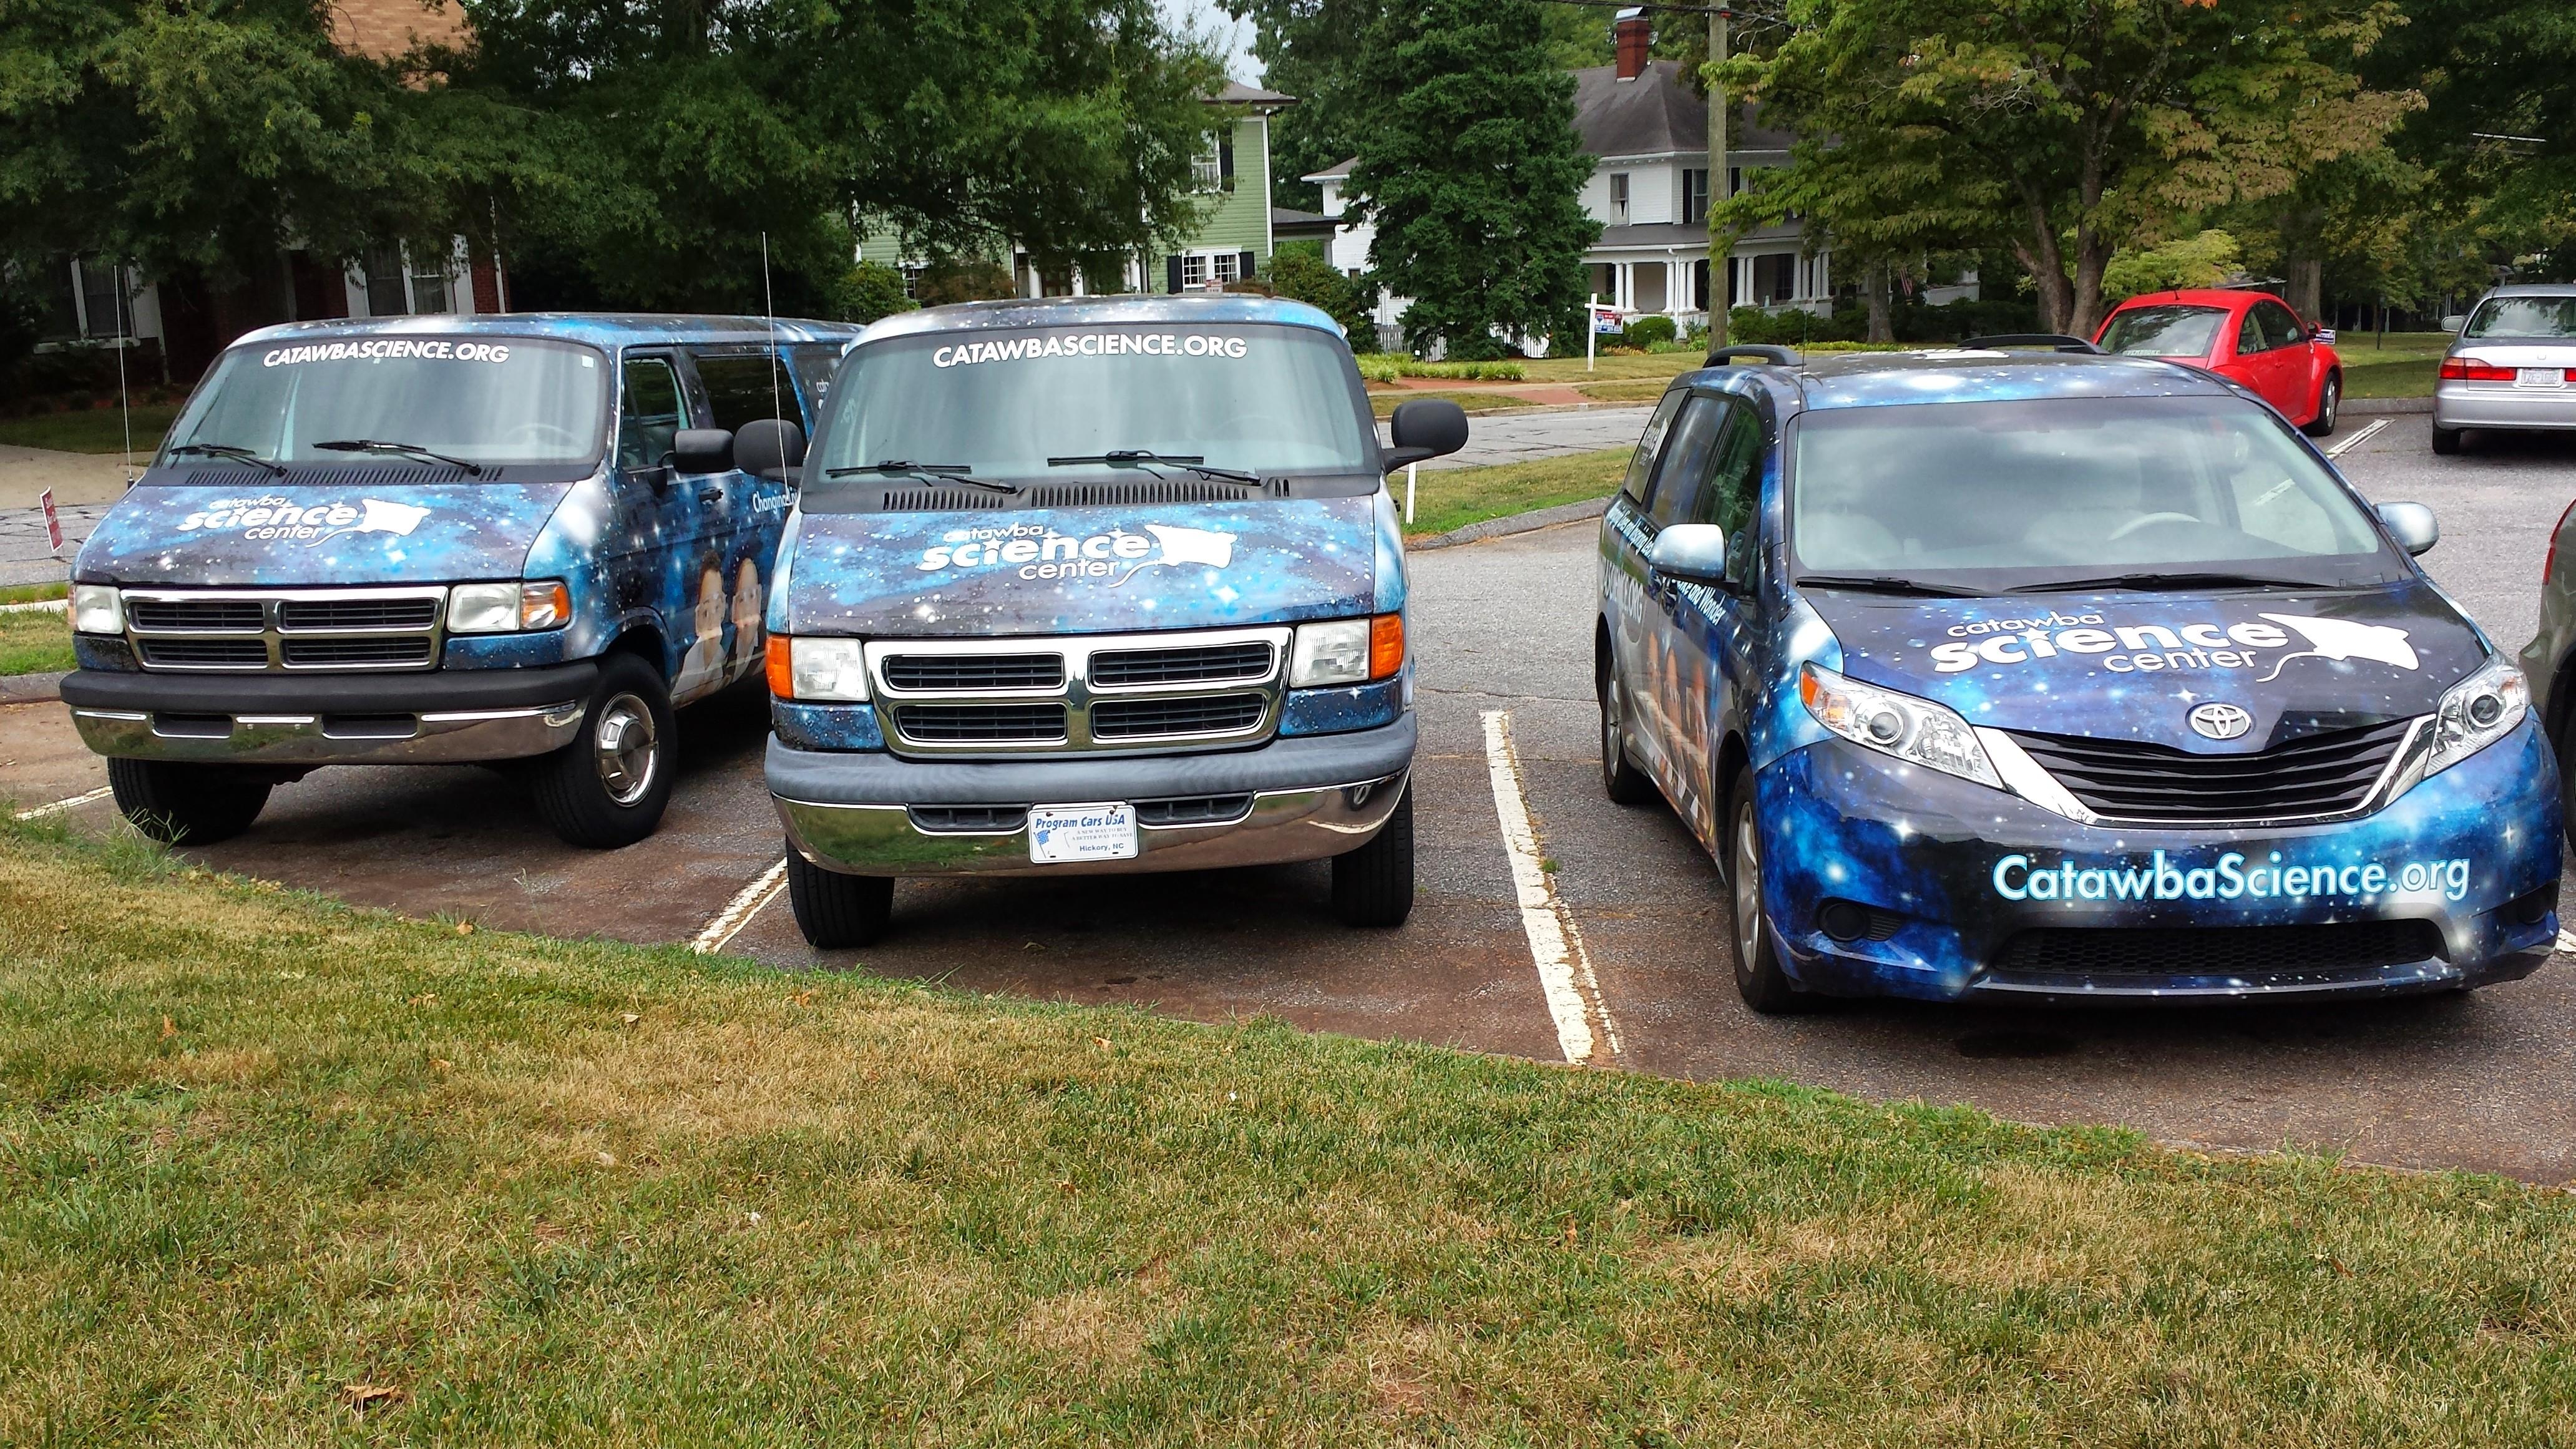 Three CSC vans